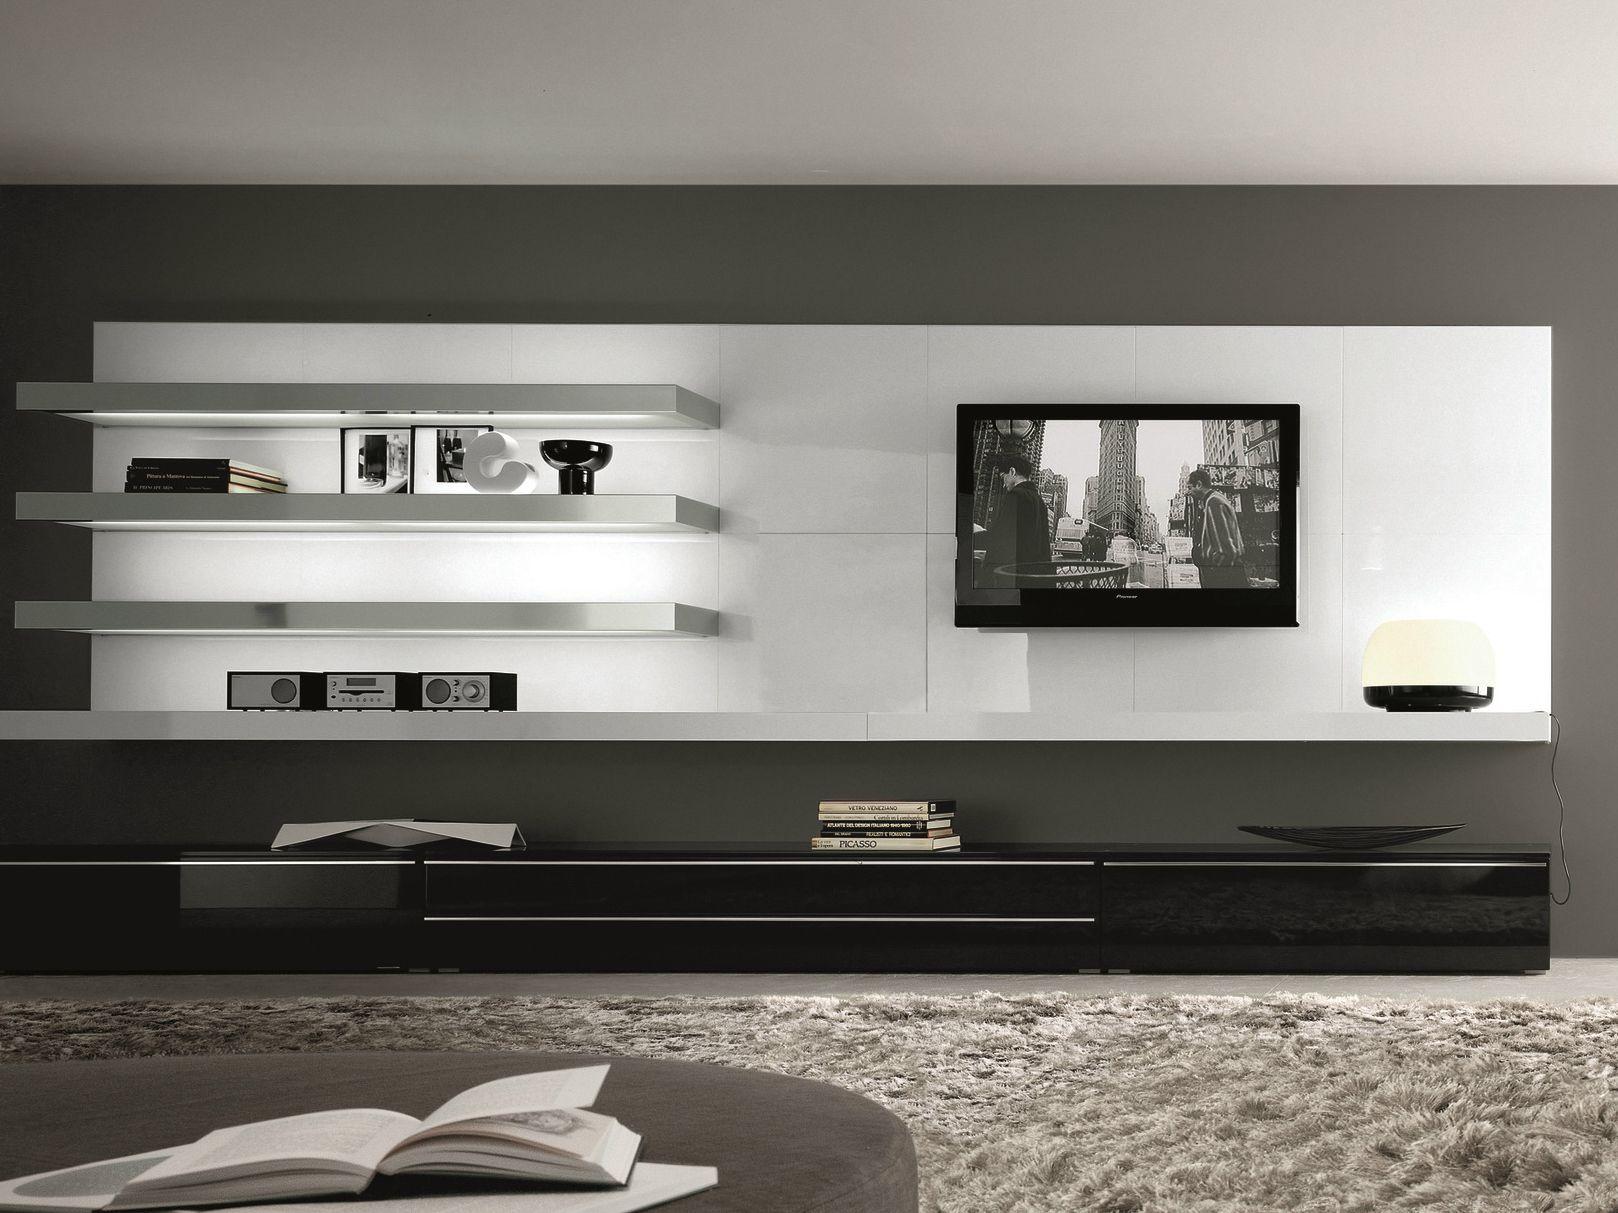 Tao day mueble modular de pared montaje pared by - Di mauro mobili ...